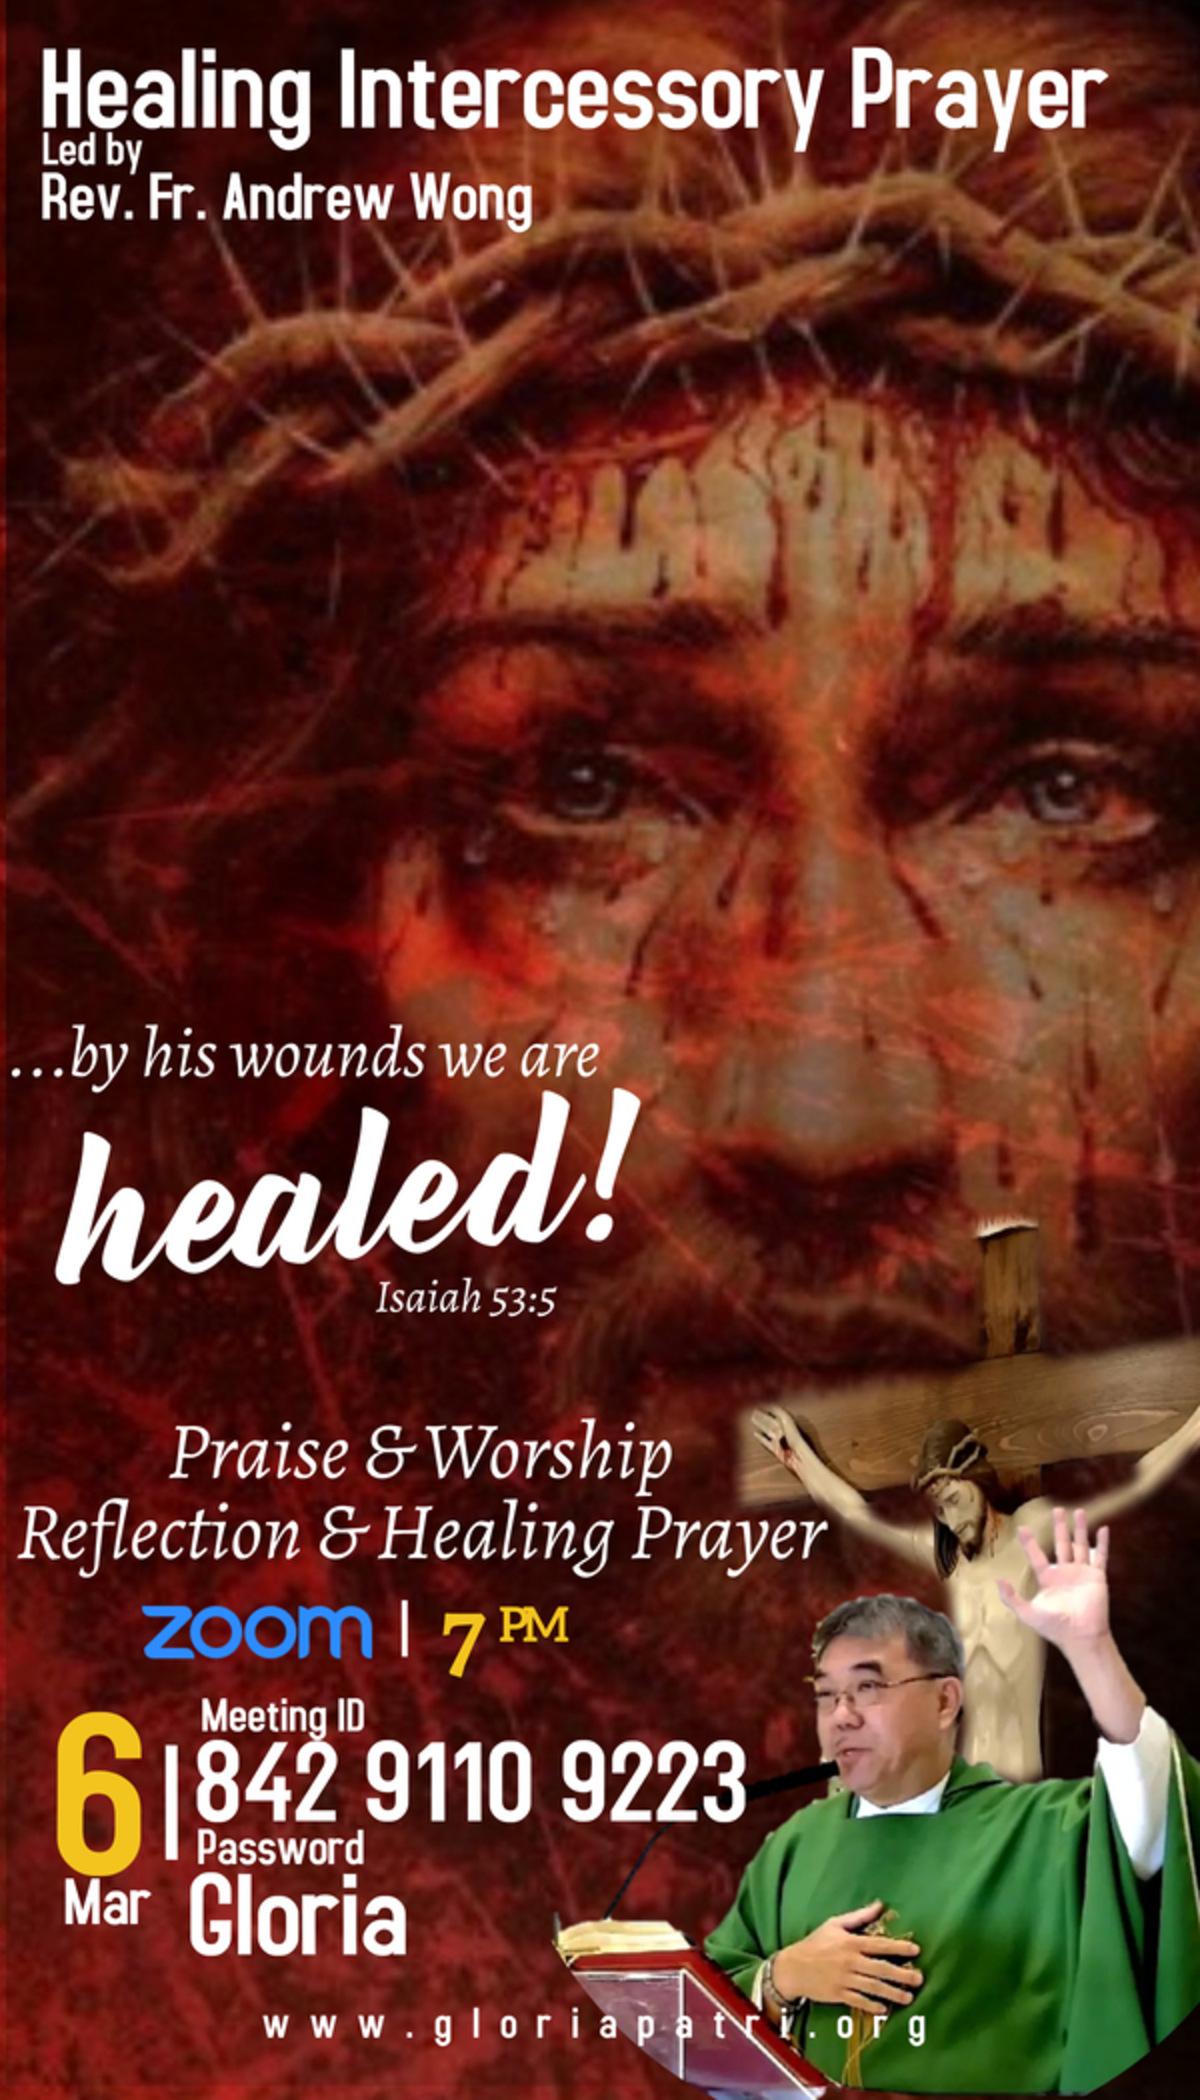 6th Mar Intercessory Healing Prayer